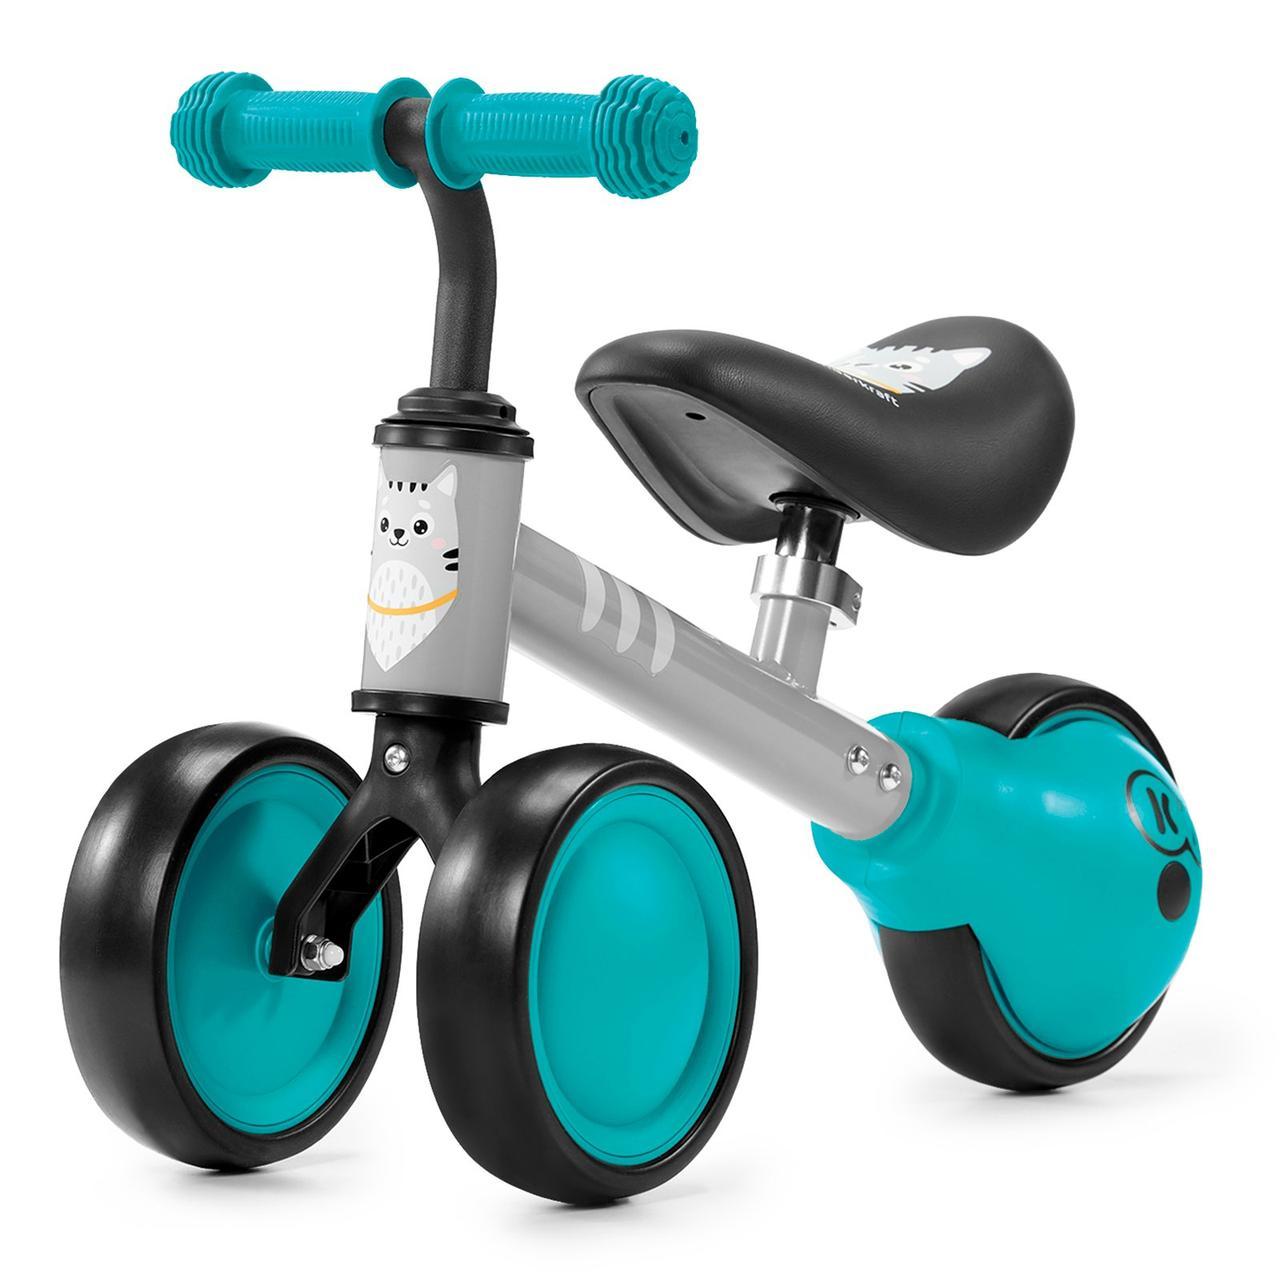 Детский беговел-каталка на трех колесах Kinderkraft Cutie turquoise